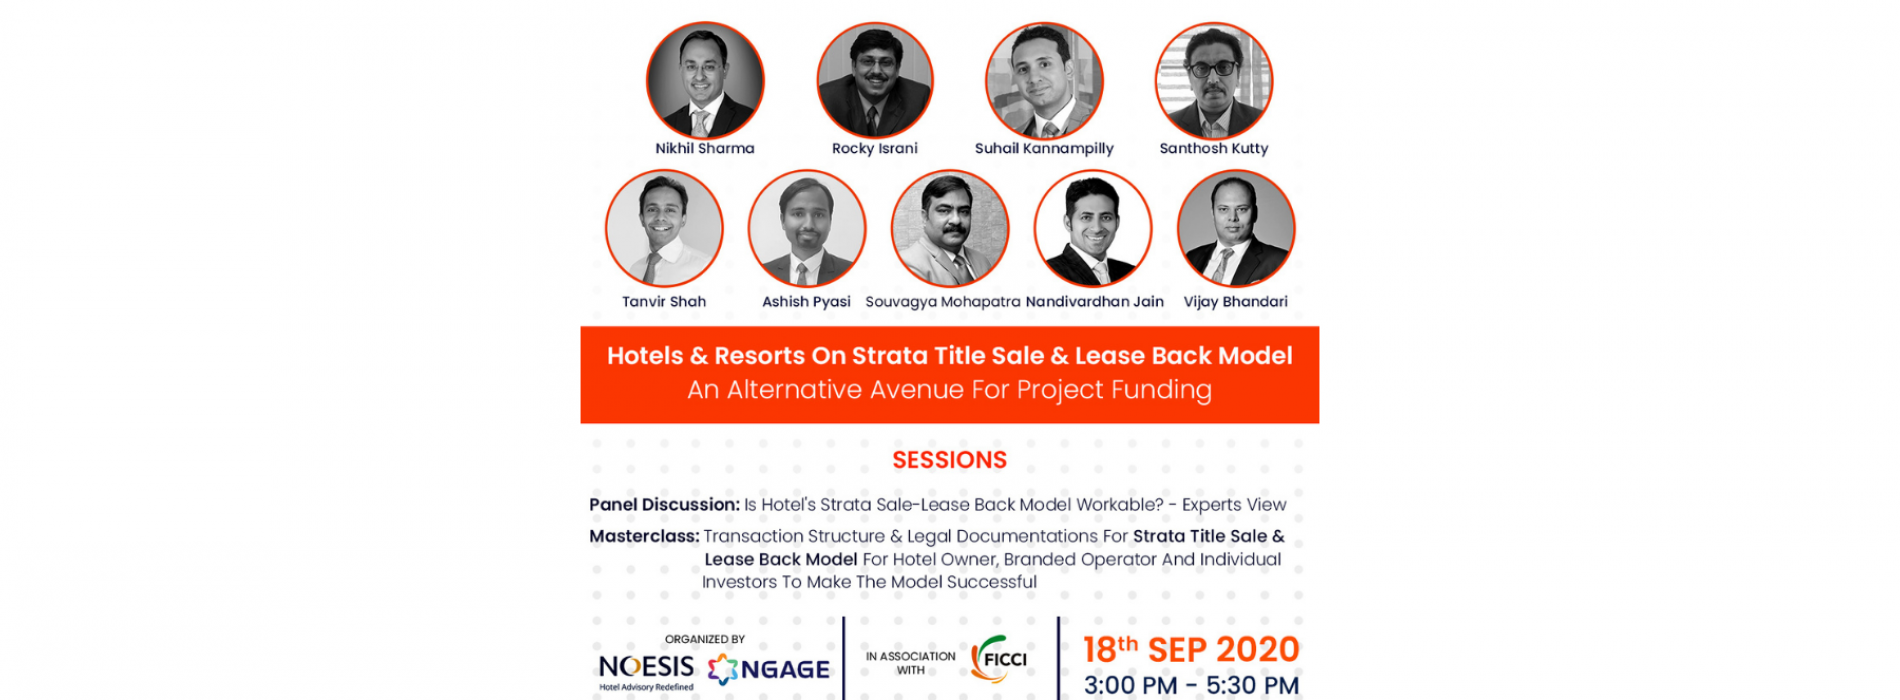 Noesis Capital Advisors & Ngage Hospitality's Live Masterclass on Sept 18th